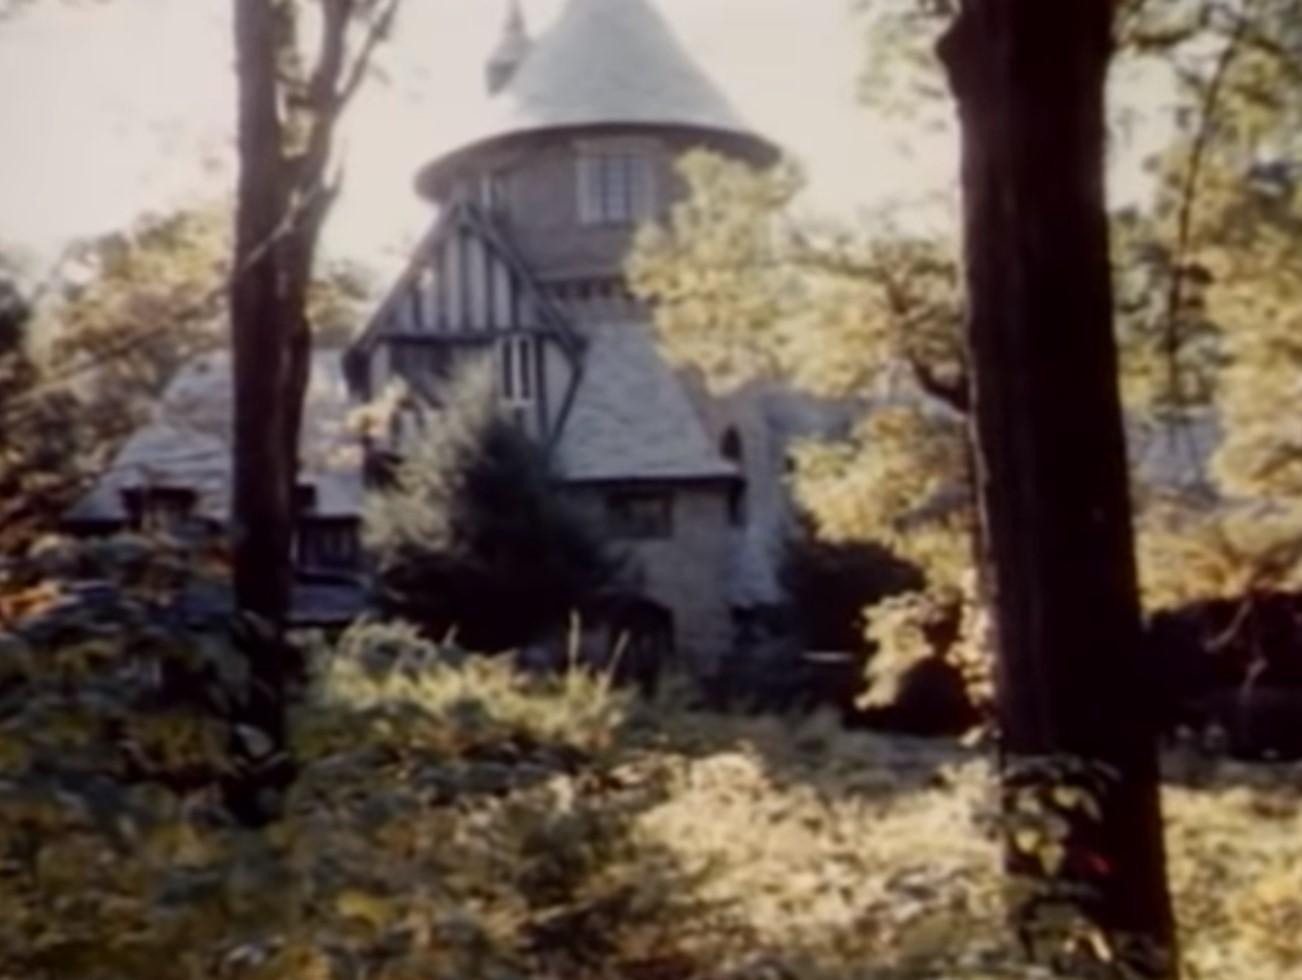 Bill beattys haunted mansion2